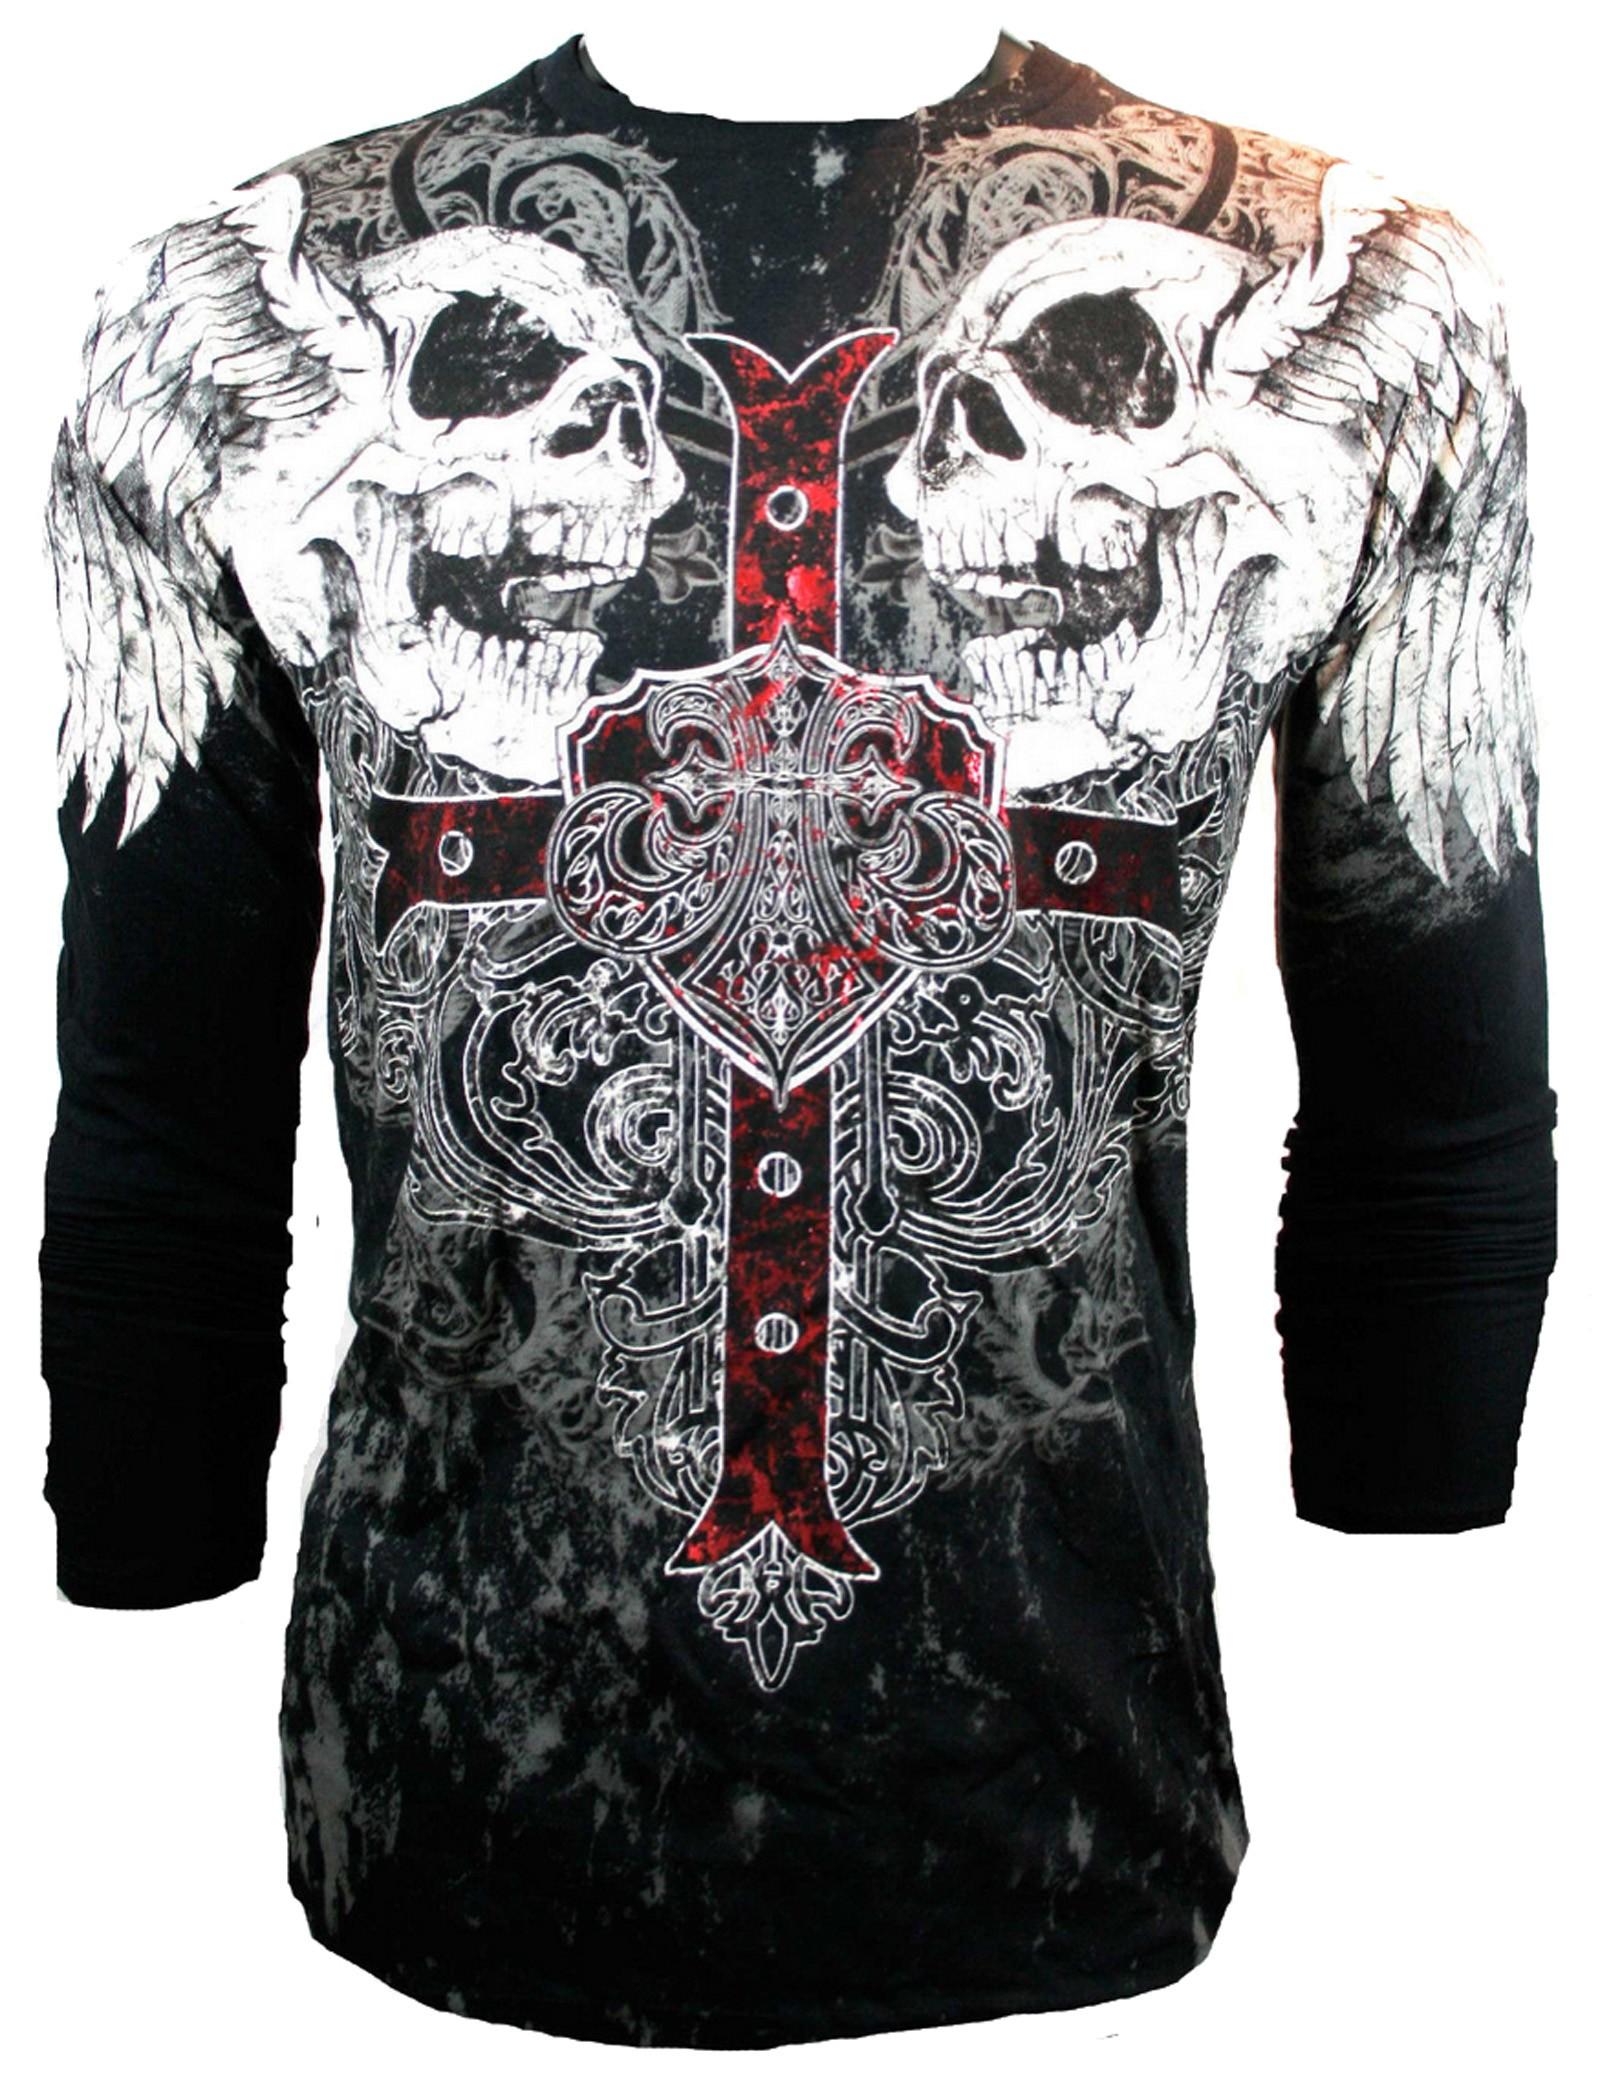 Xzavier - Screaming Skulls Longsleeve T-Shirt